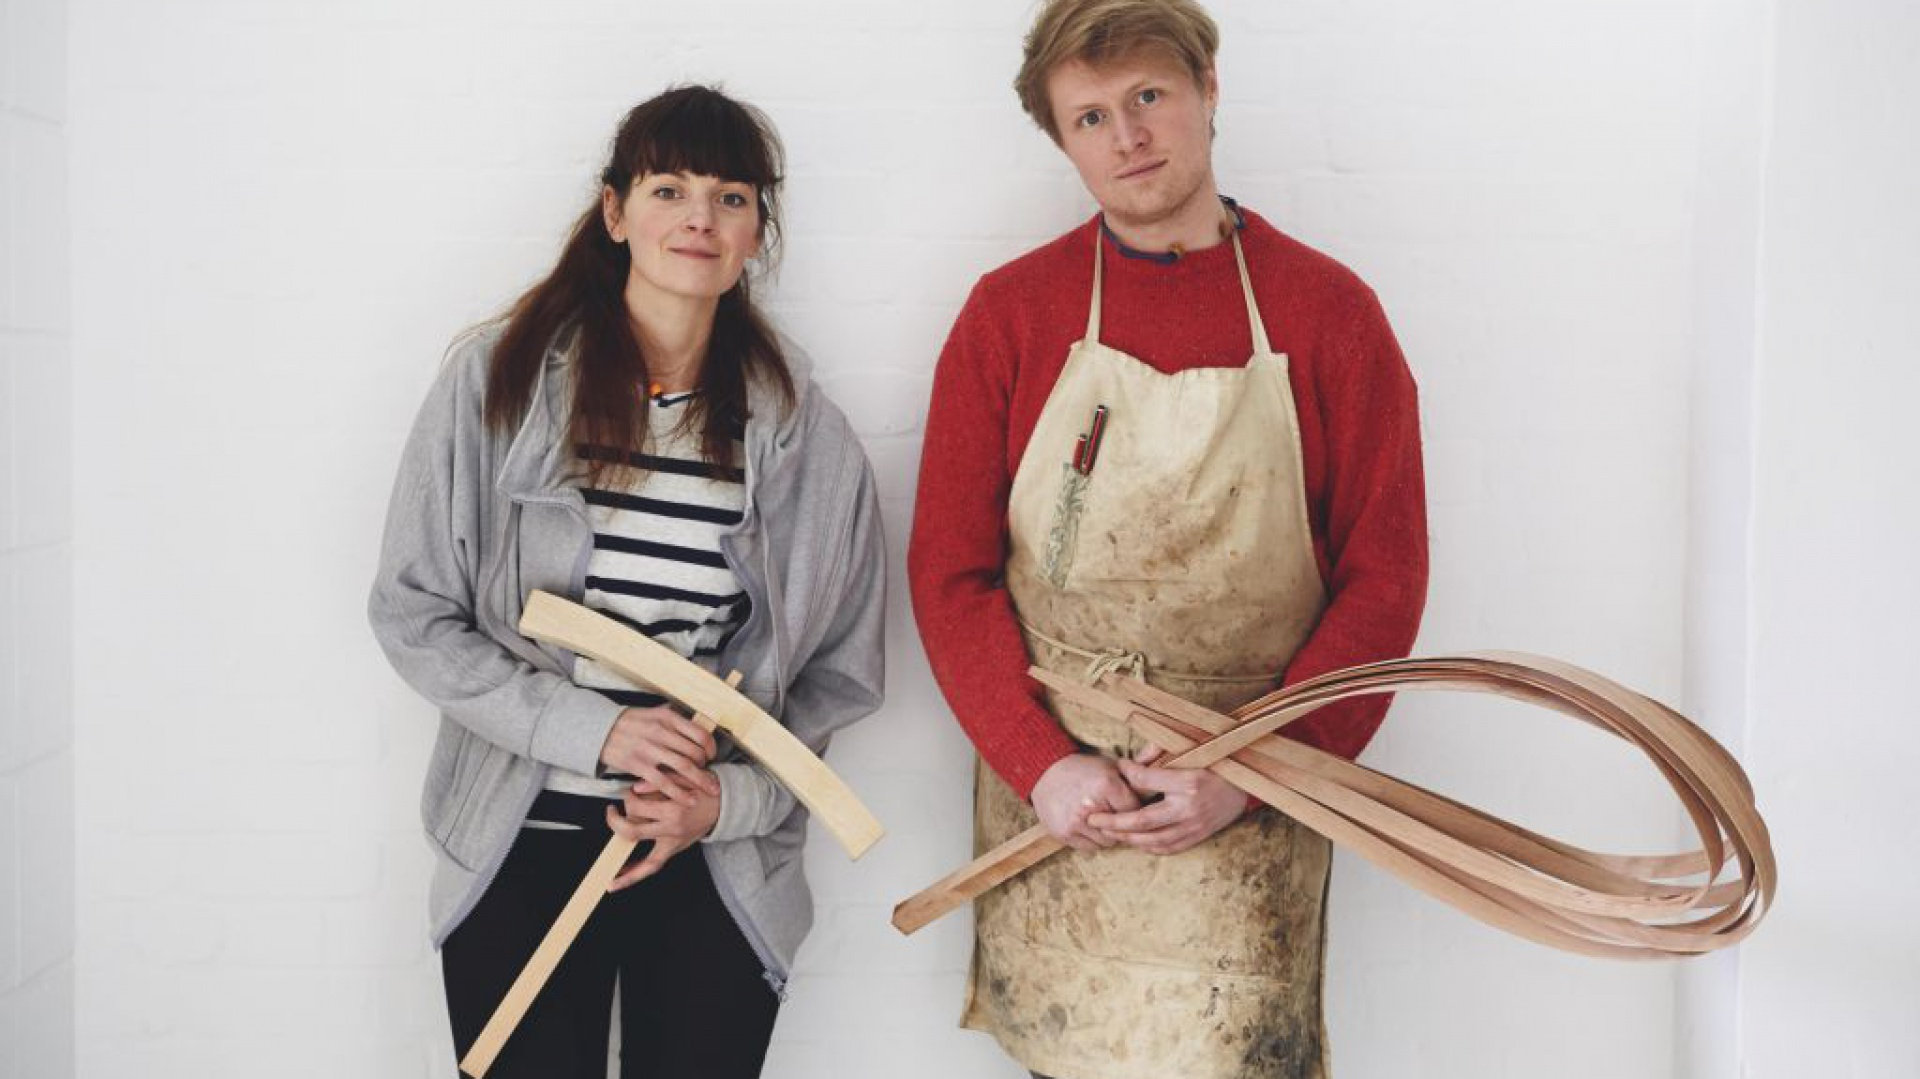 Laura Ellen Bacon, rzeźbiarka oraz Sebastian Cox, projektant mebli. Fot. Jon Cardwell